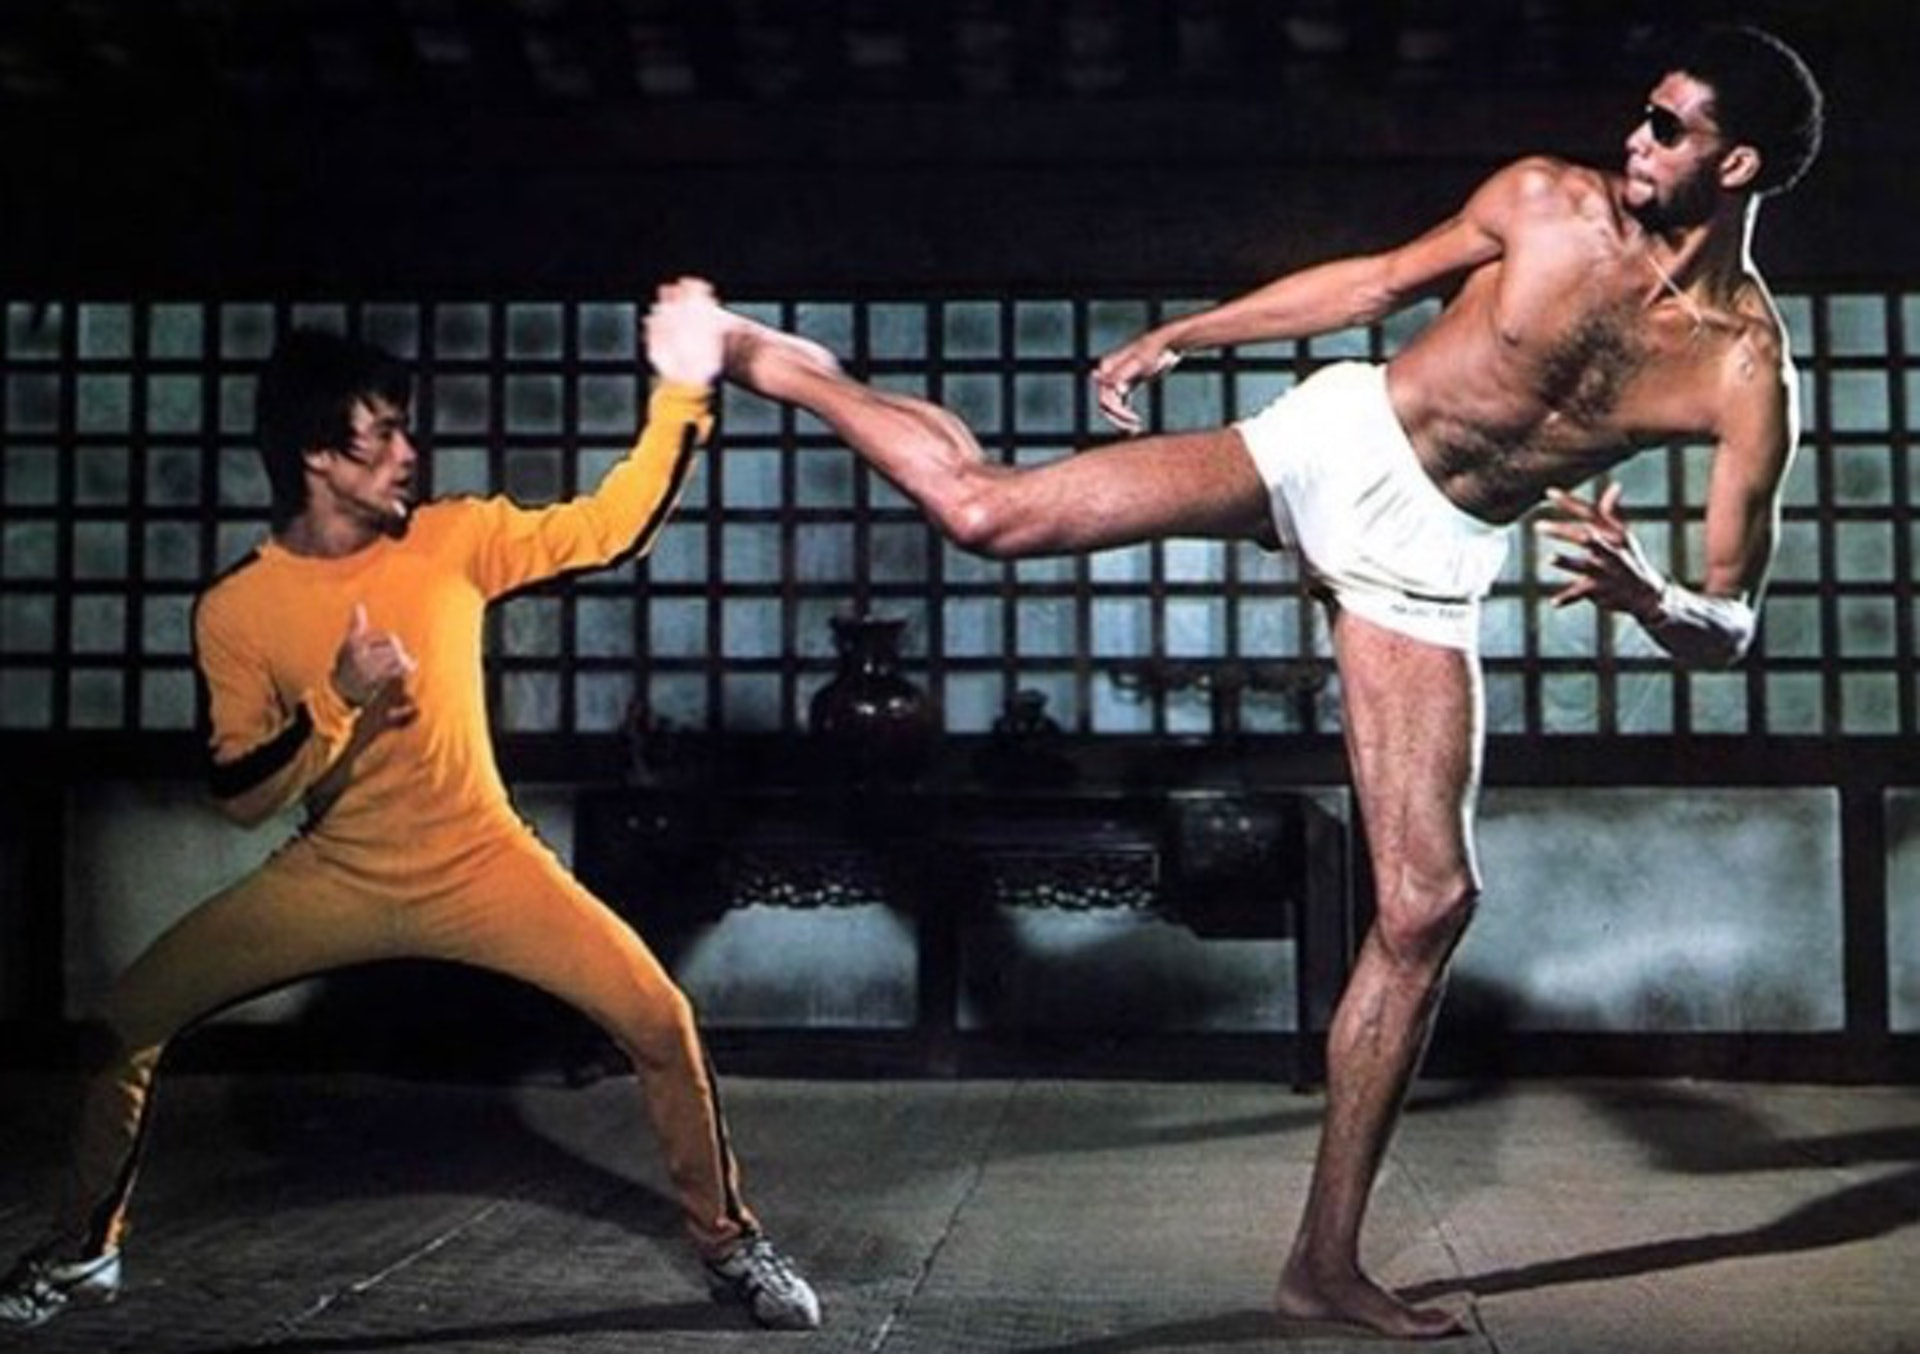 Bruce Lee & Kareem Abdul-Jabbar - Game of Death